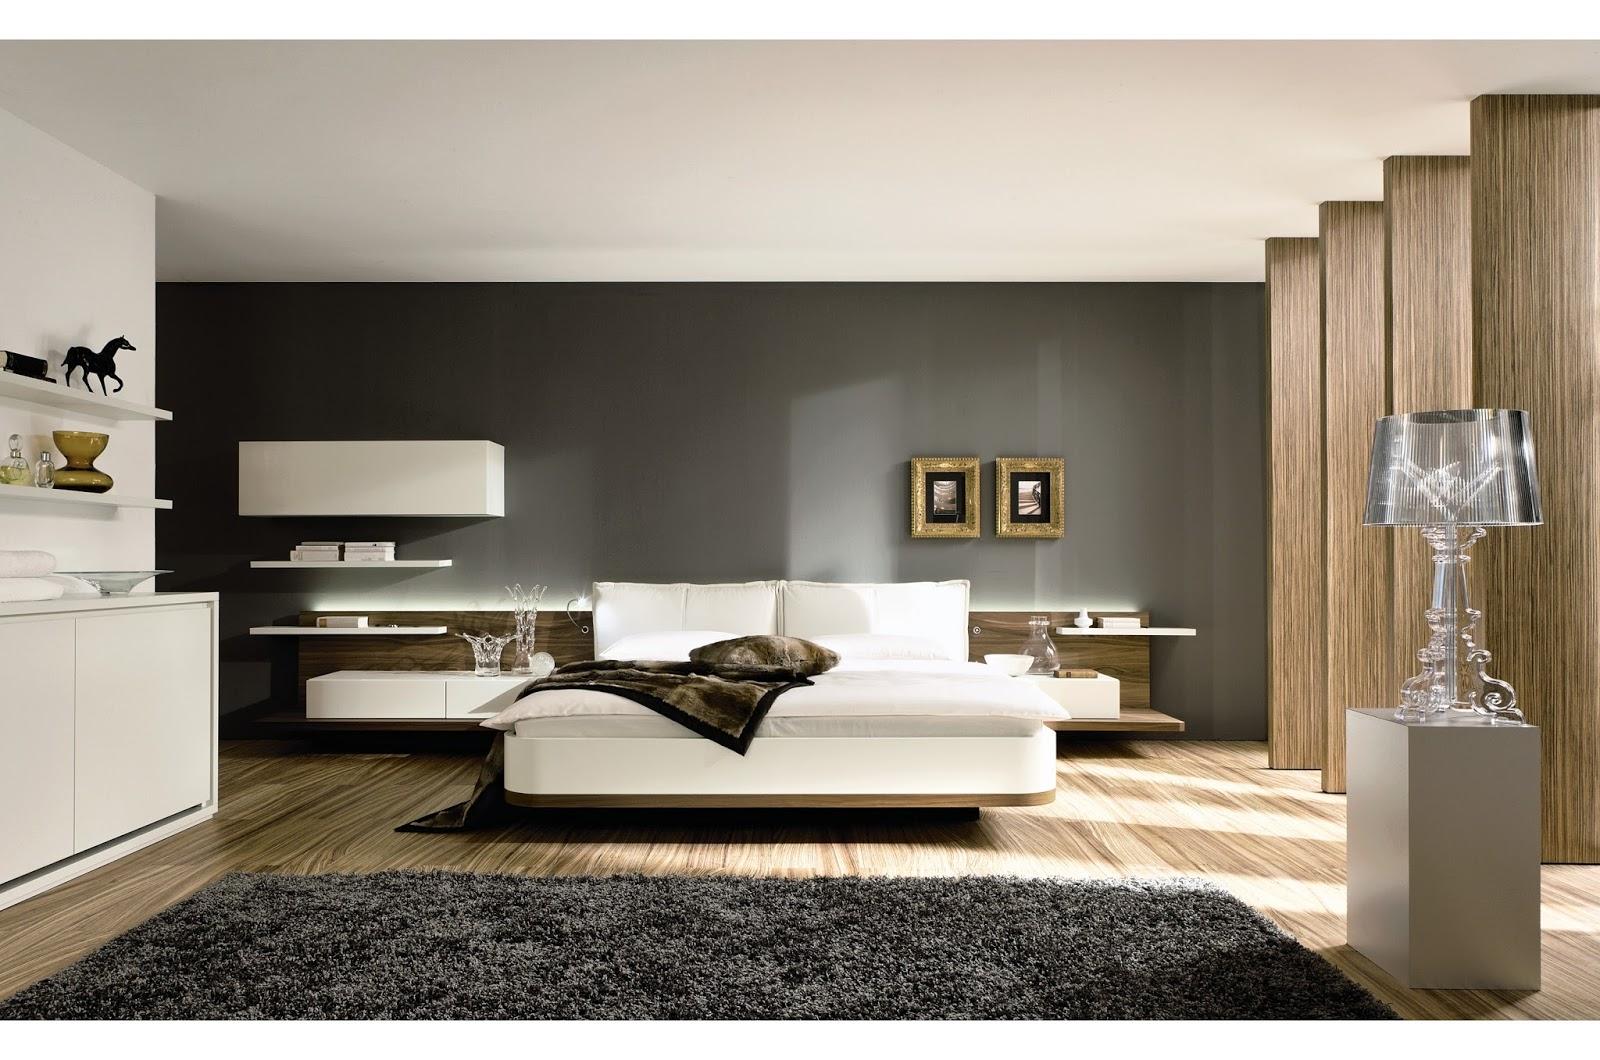 Bedroom Interior Decorating